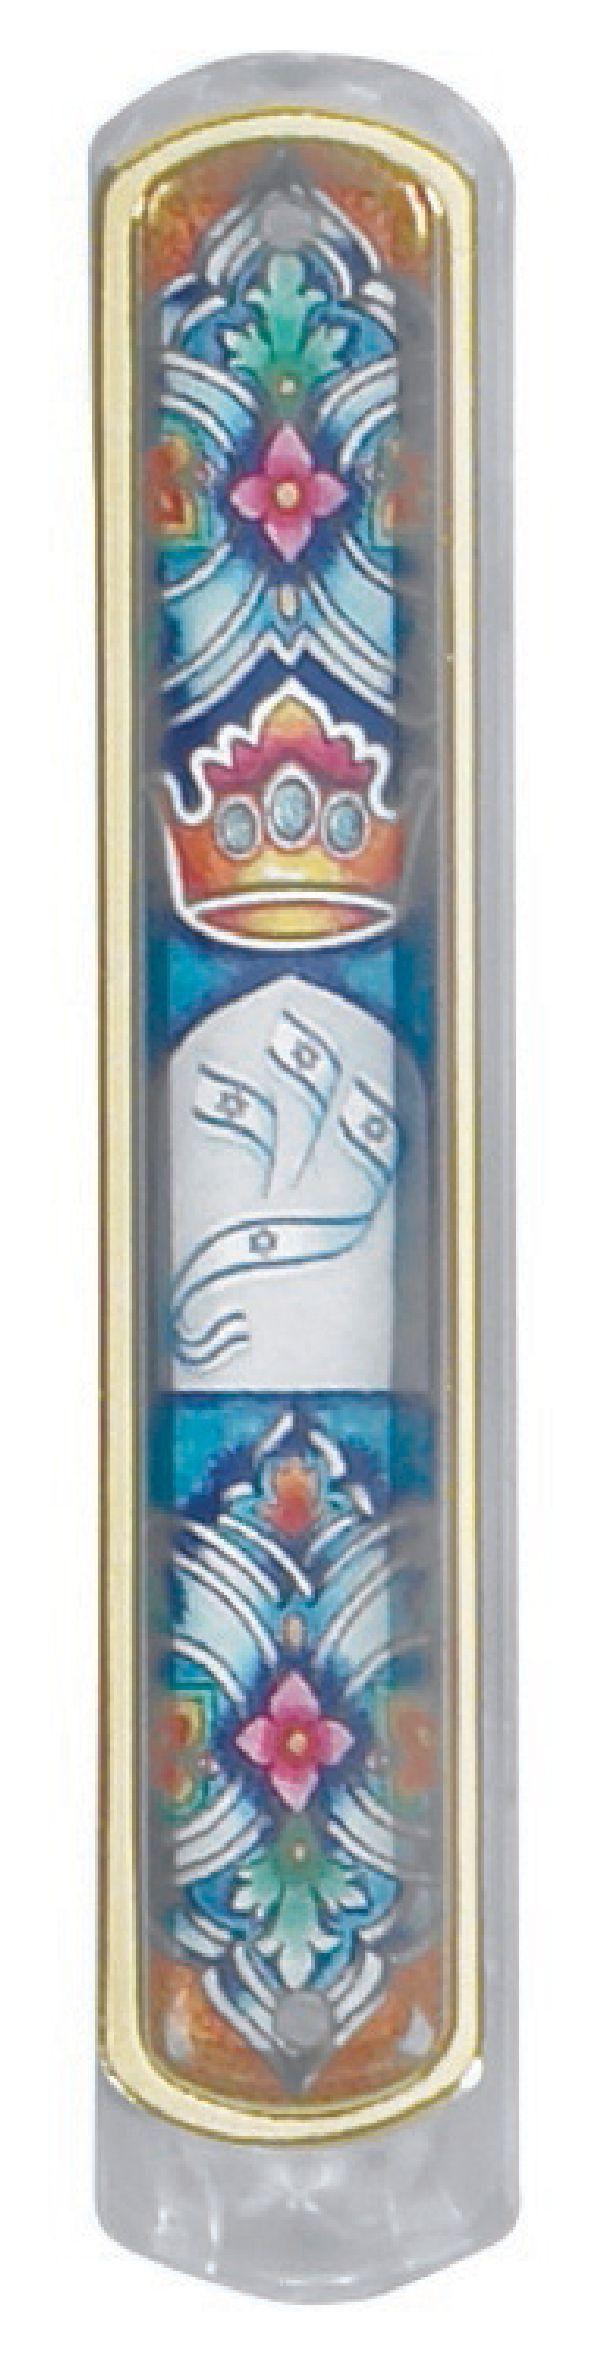 Puffed Israeli Flag Design Mezuza Case. Size 7cm